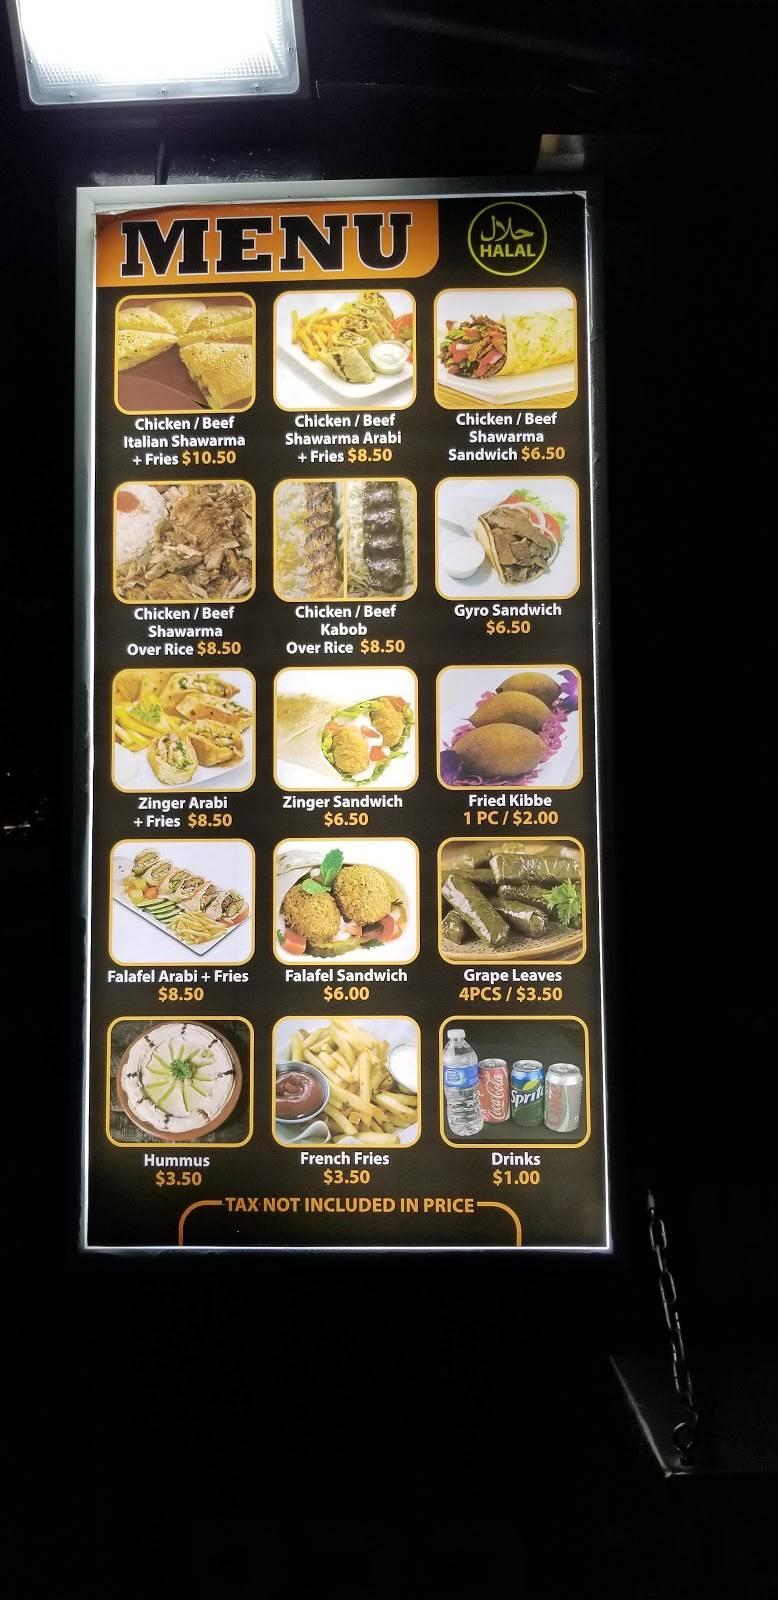 Abu Omar Halal - FM1960 | restaurant | 7725 Farm to Market 1960 Bypass Rd W, Humble, TX 77338, USA | 8323404063 OR +1 832-340-4063